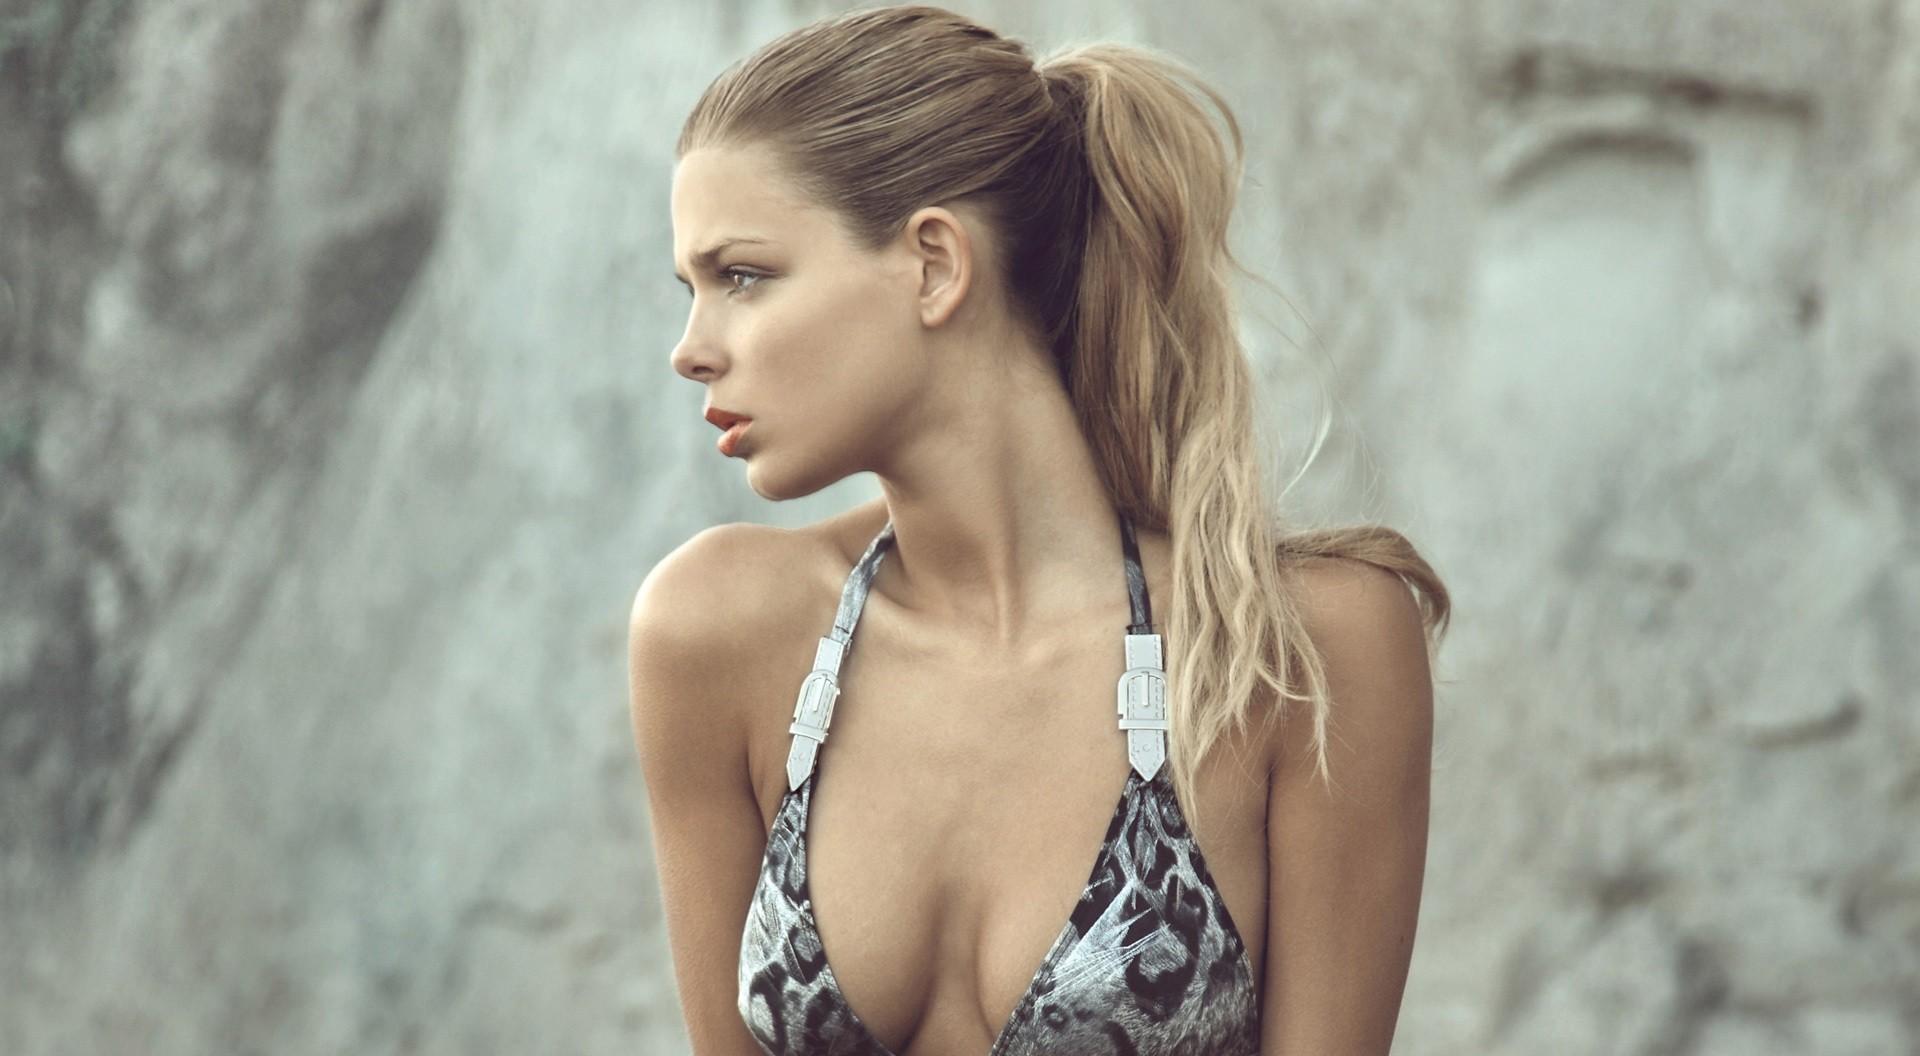 Cleavage Danielle Knudson nudes (46 photo), Sexy, Sideboobs, Selfie, in bikini 2019